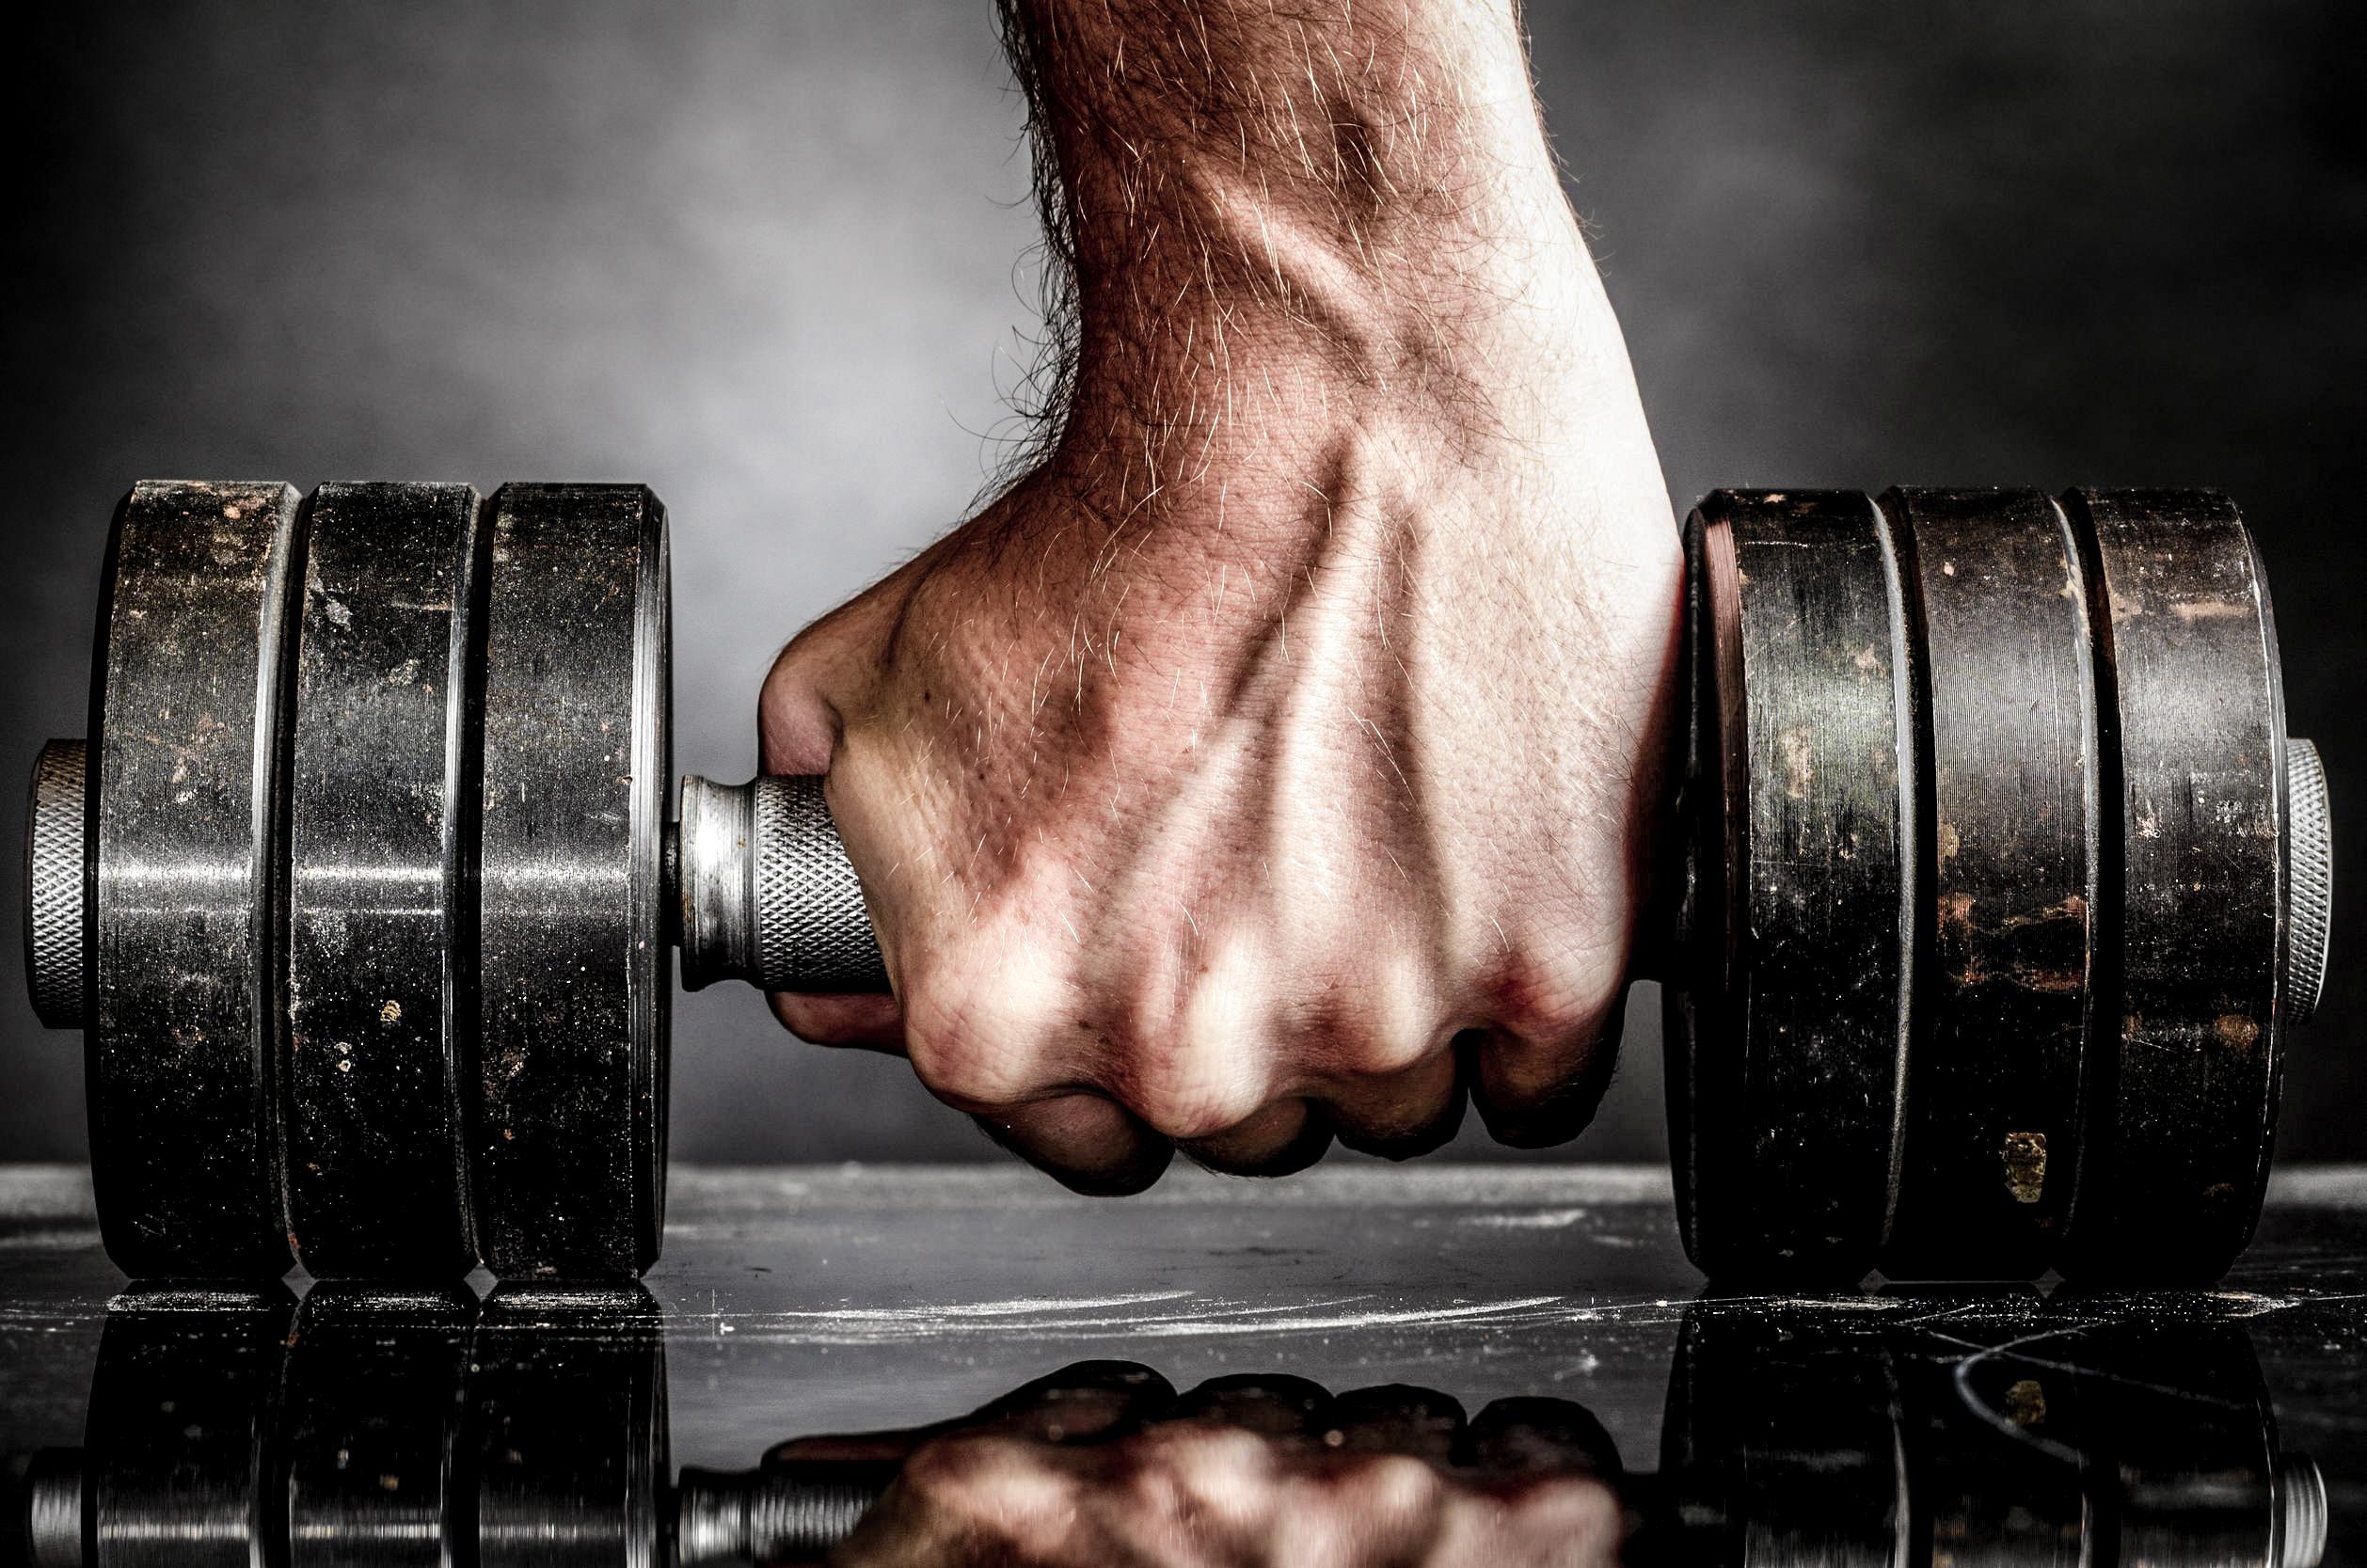 Como aumentar testosterona no corpo